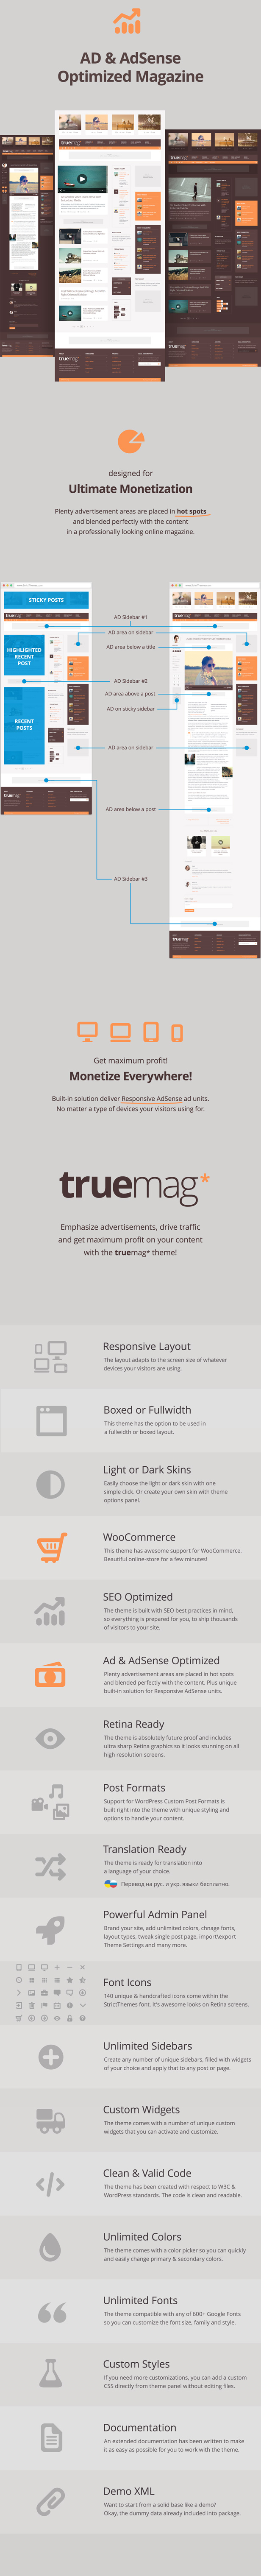 Truemag - AD & AdSense Optimized Magazine WordPress Theme